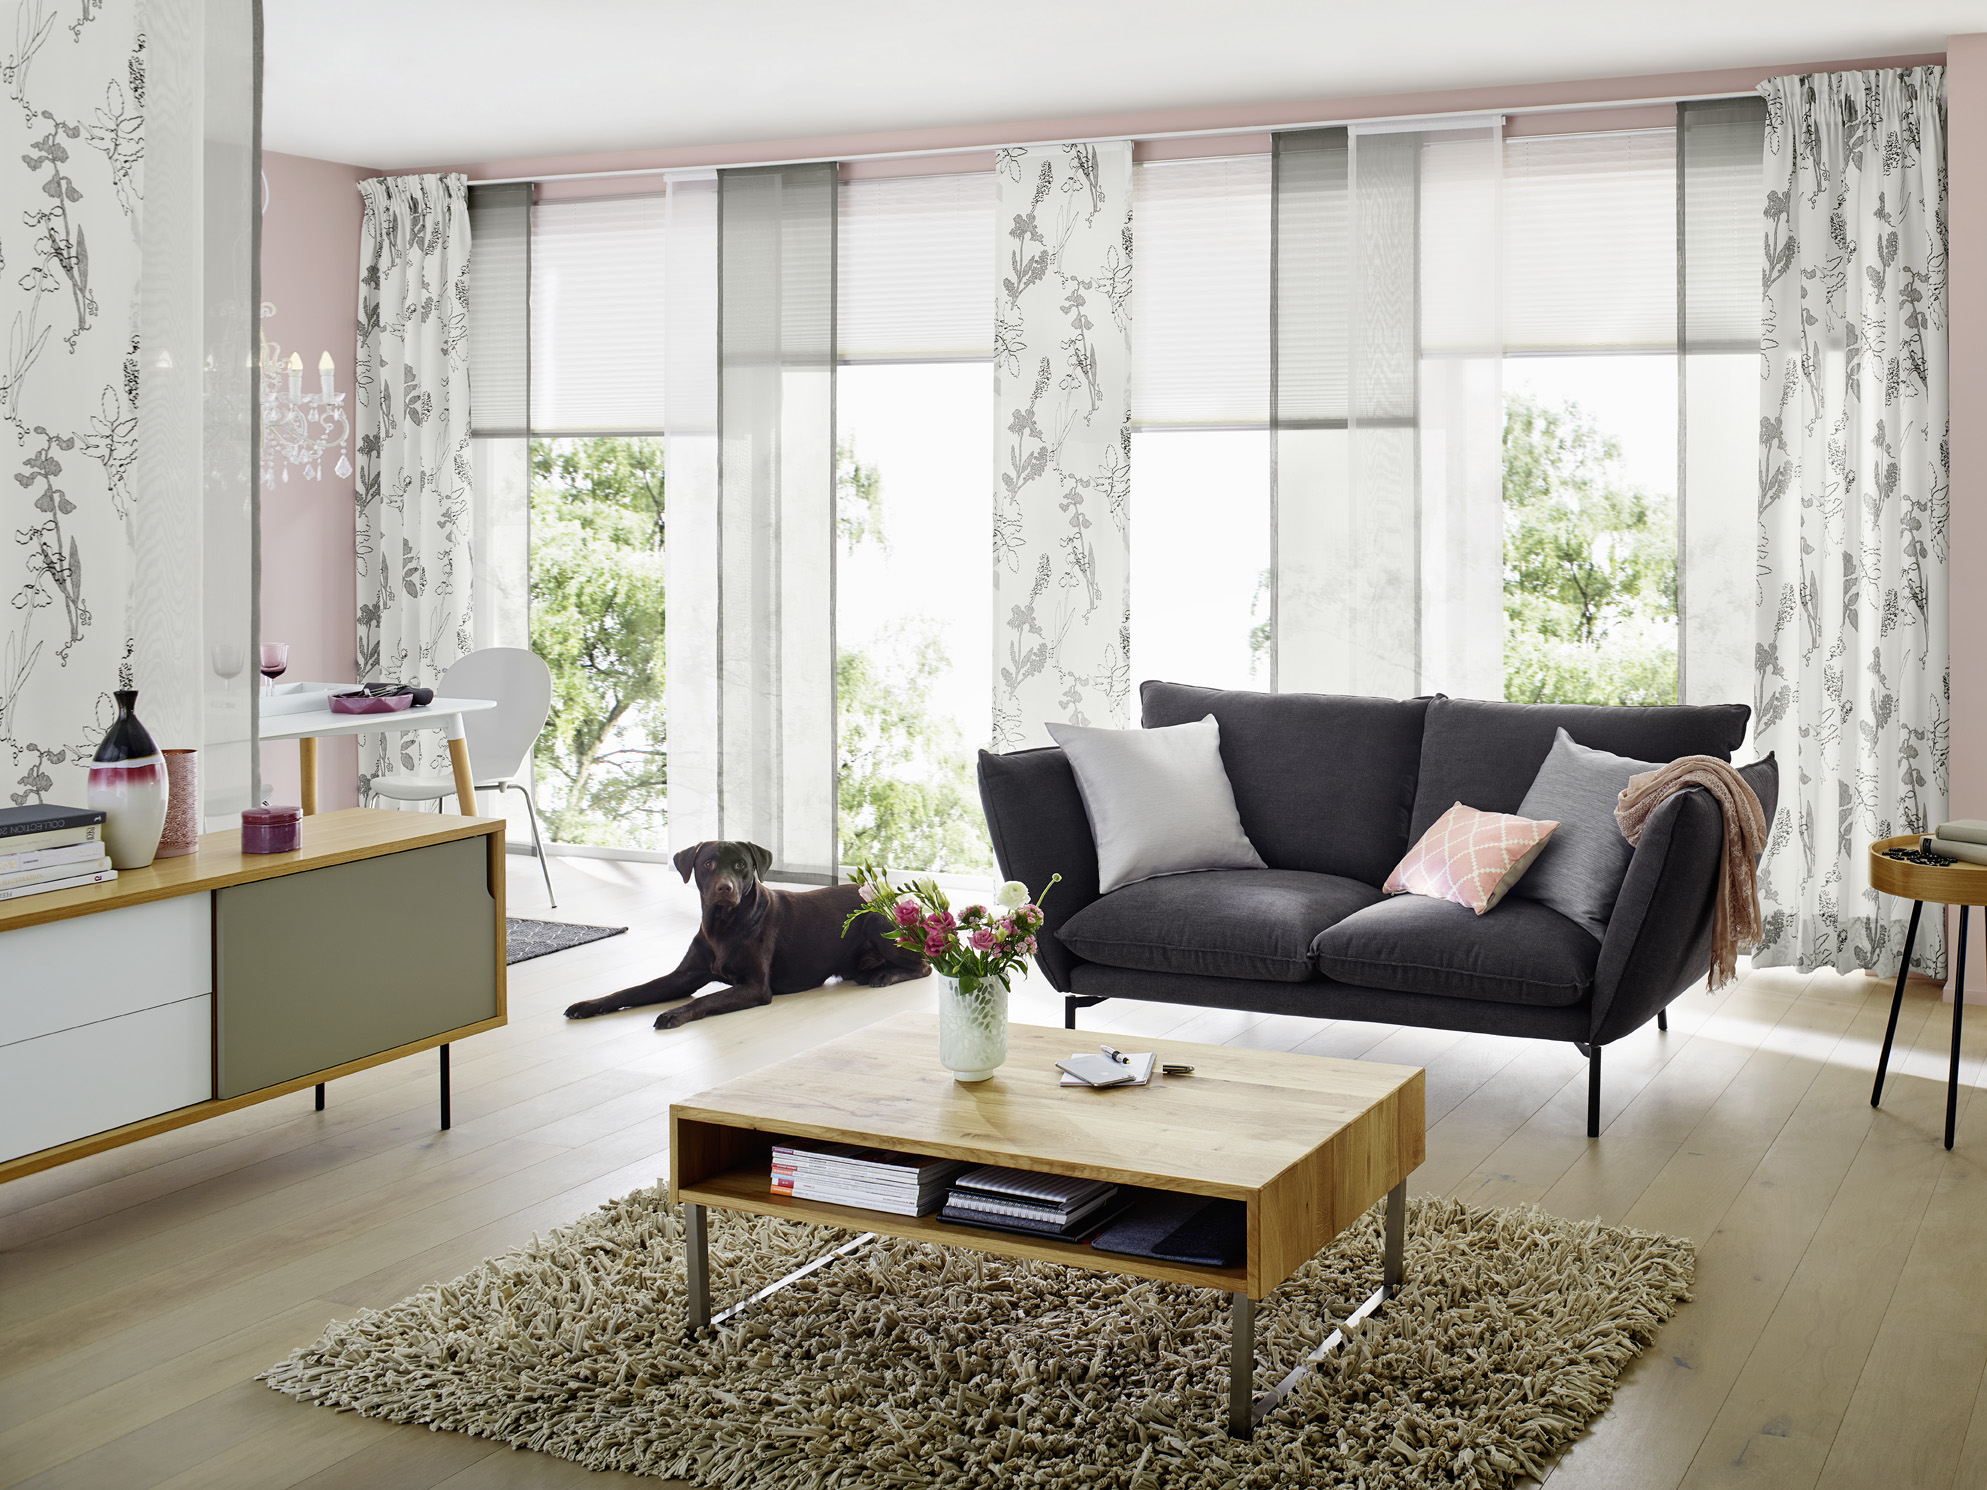 gardinen schwabacher gardinenhaus raumausstattung kastner. Black Bedroom Furniture Sets. Home Design Ideas